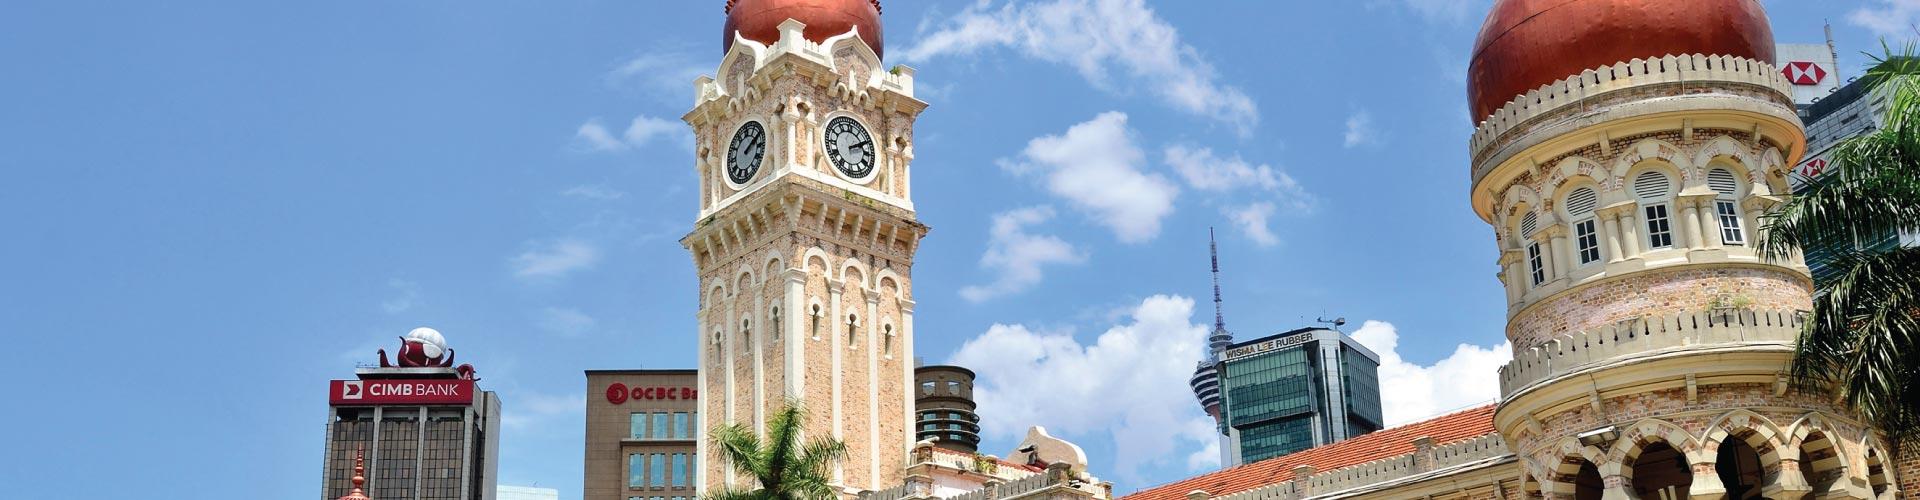 Port Klang Cruise (Royal Caribbean)